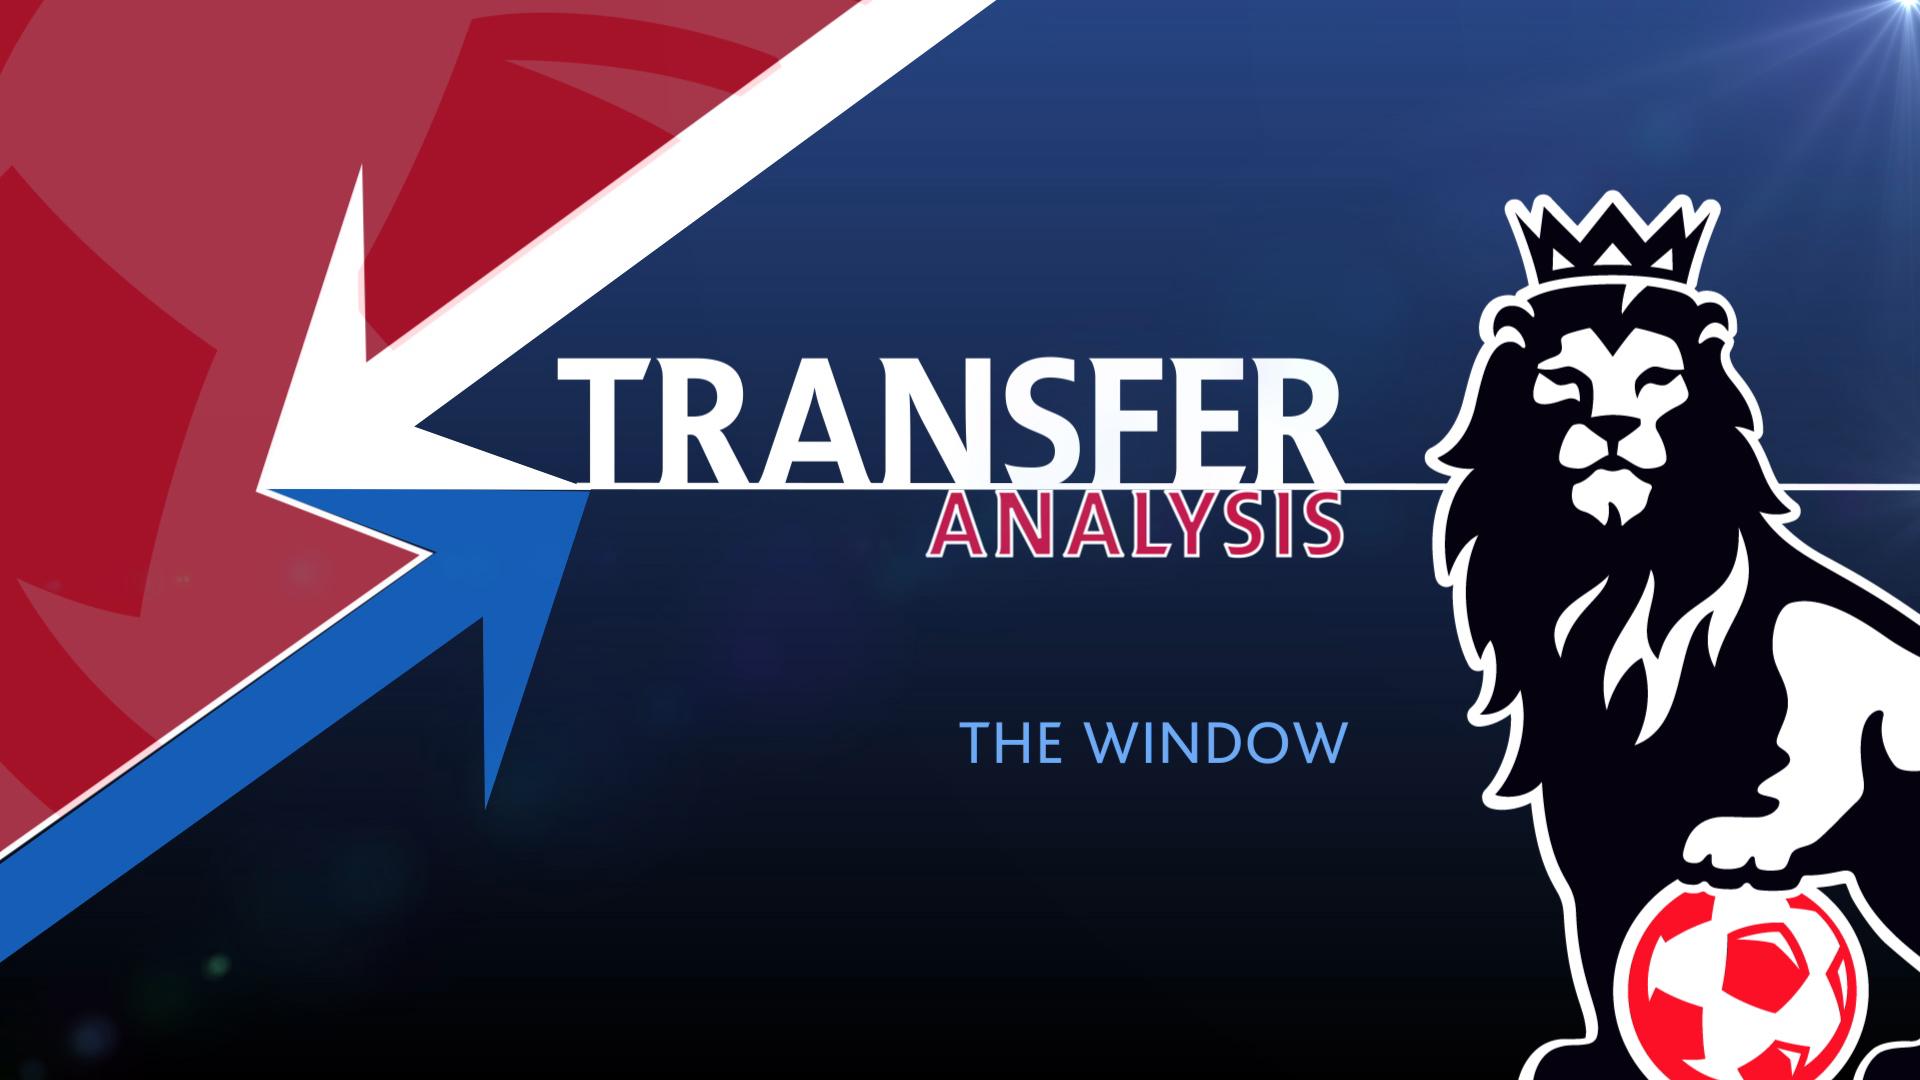 TransferWindow05.jpg